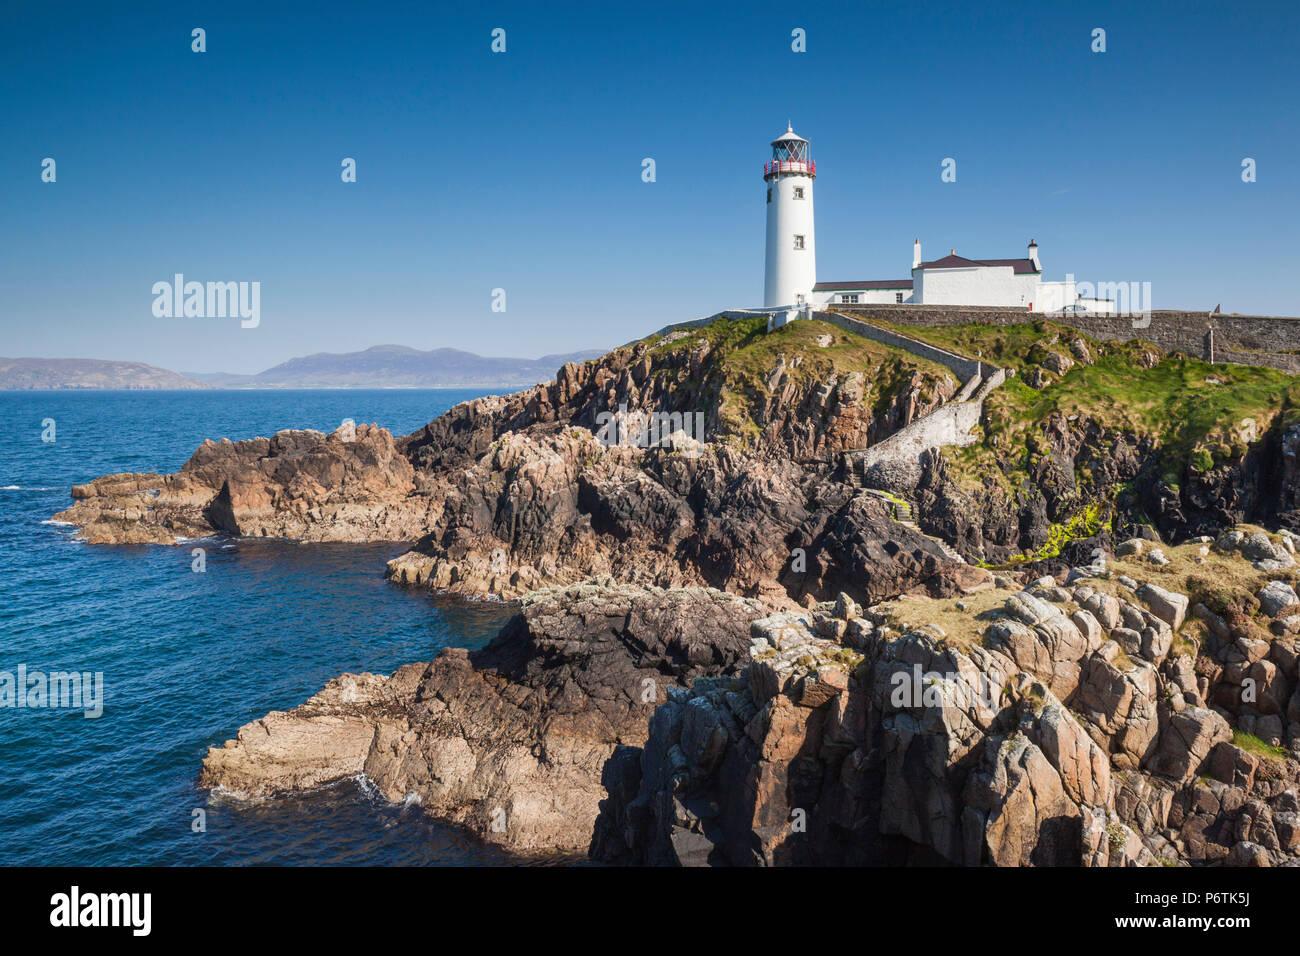 Ireland, County Donegal, Fanad Peninsula, Fanad Head Lighthouse - Stock Image